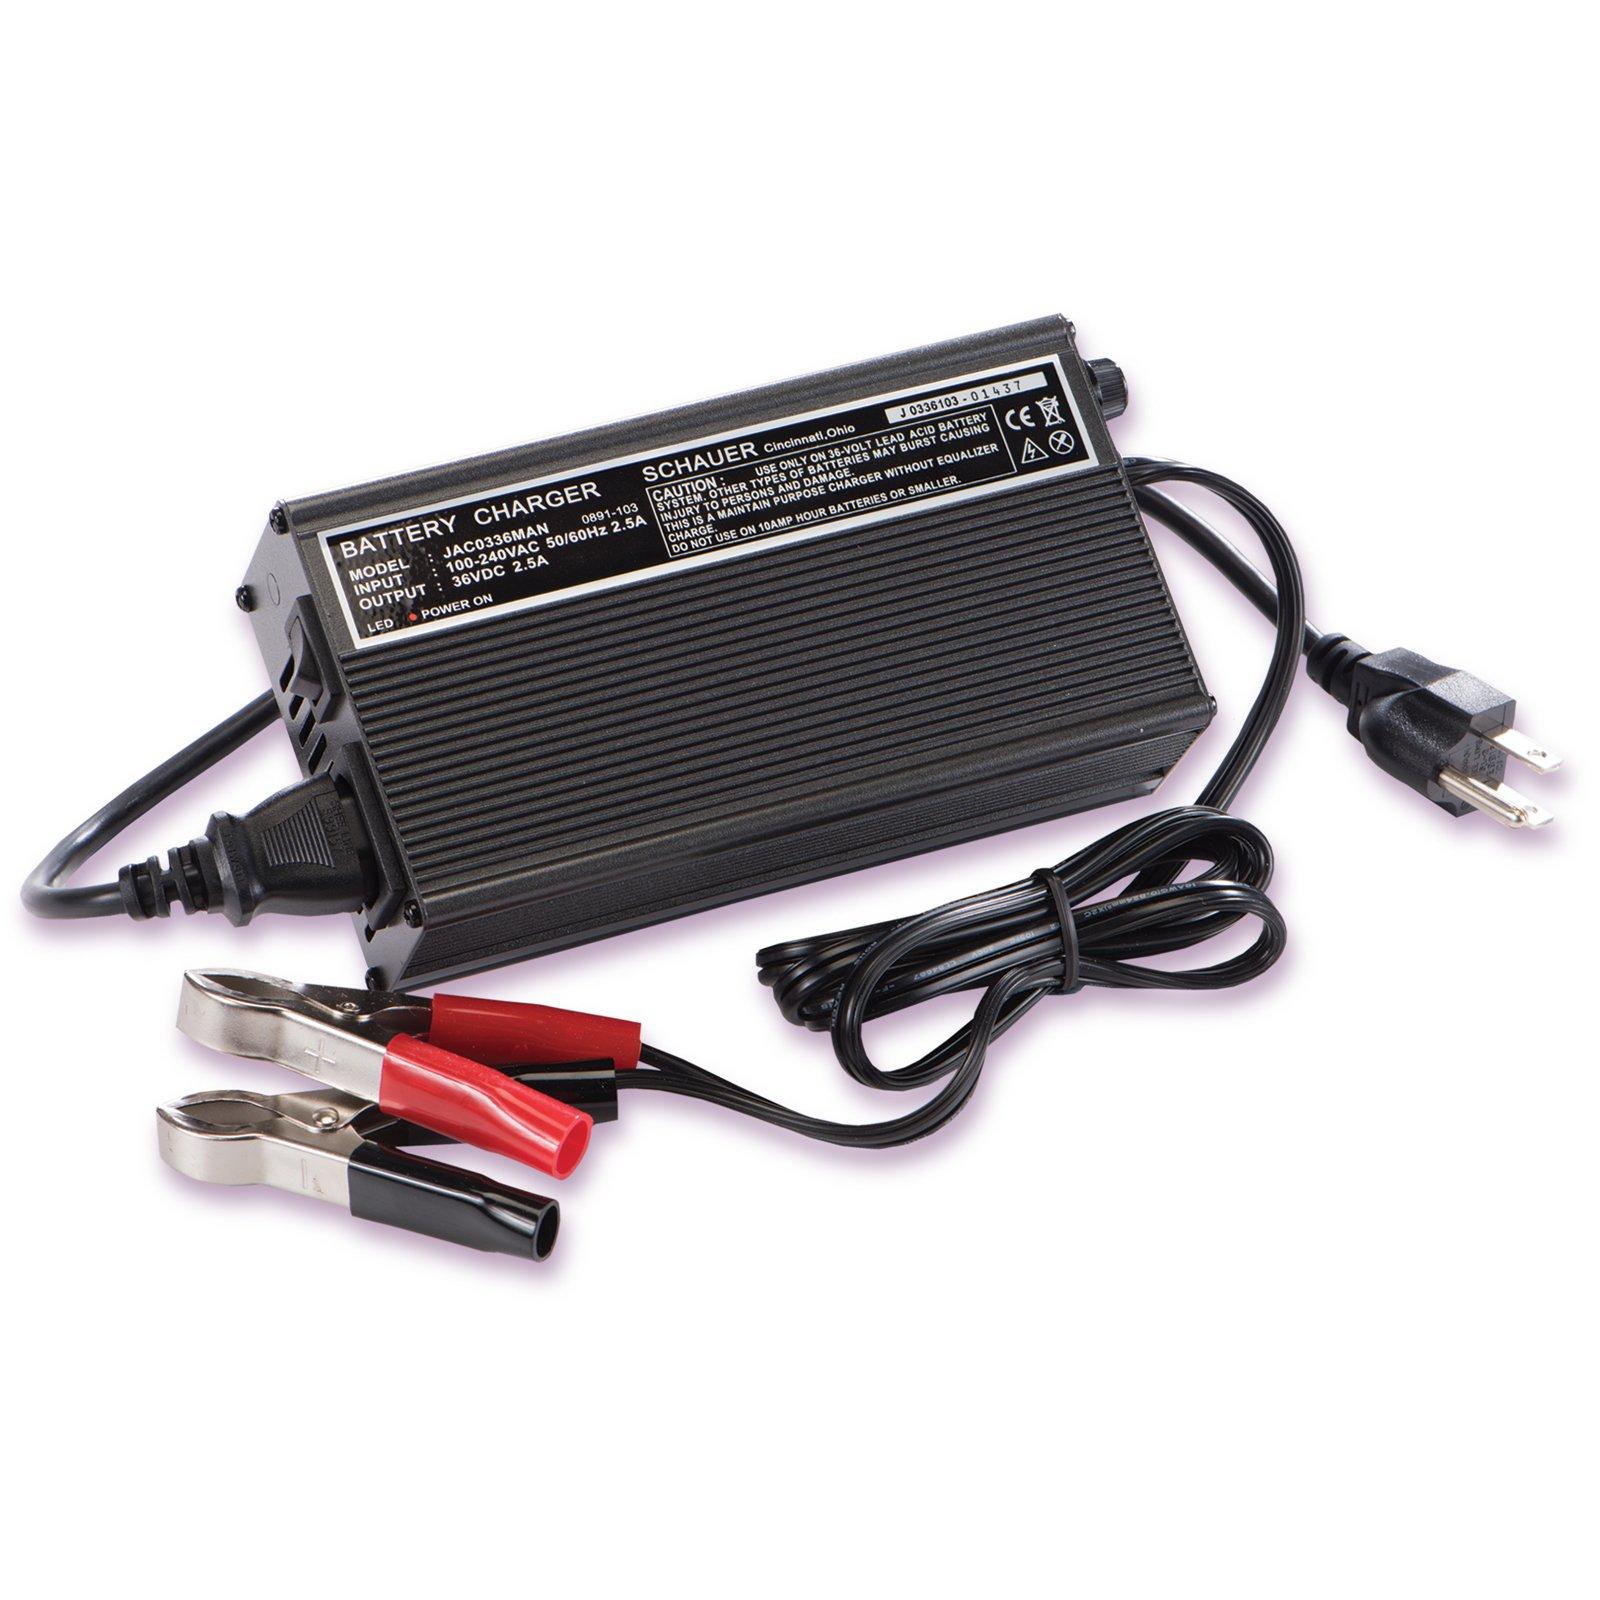 schauer jac0348man 48 volt golf cart battery maintainer. Black Bedroom Furniture Sets. Home Design Ideas